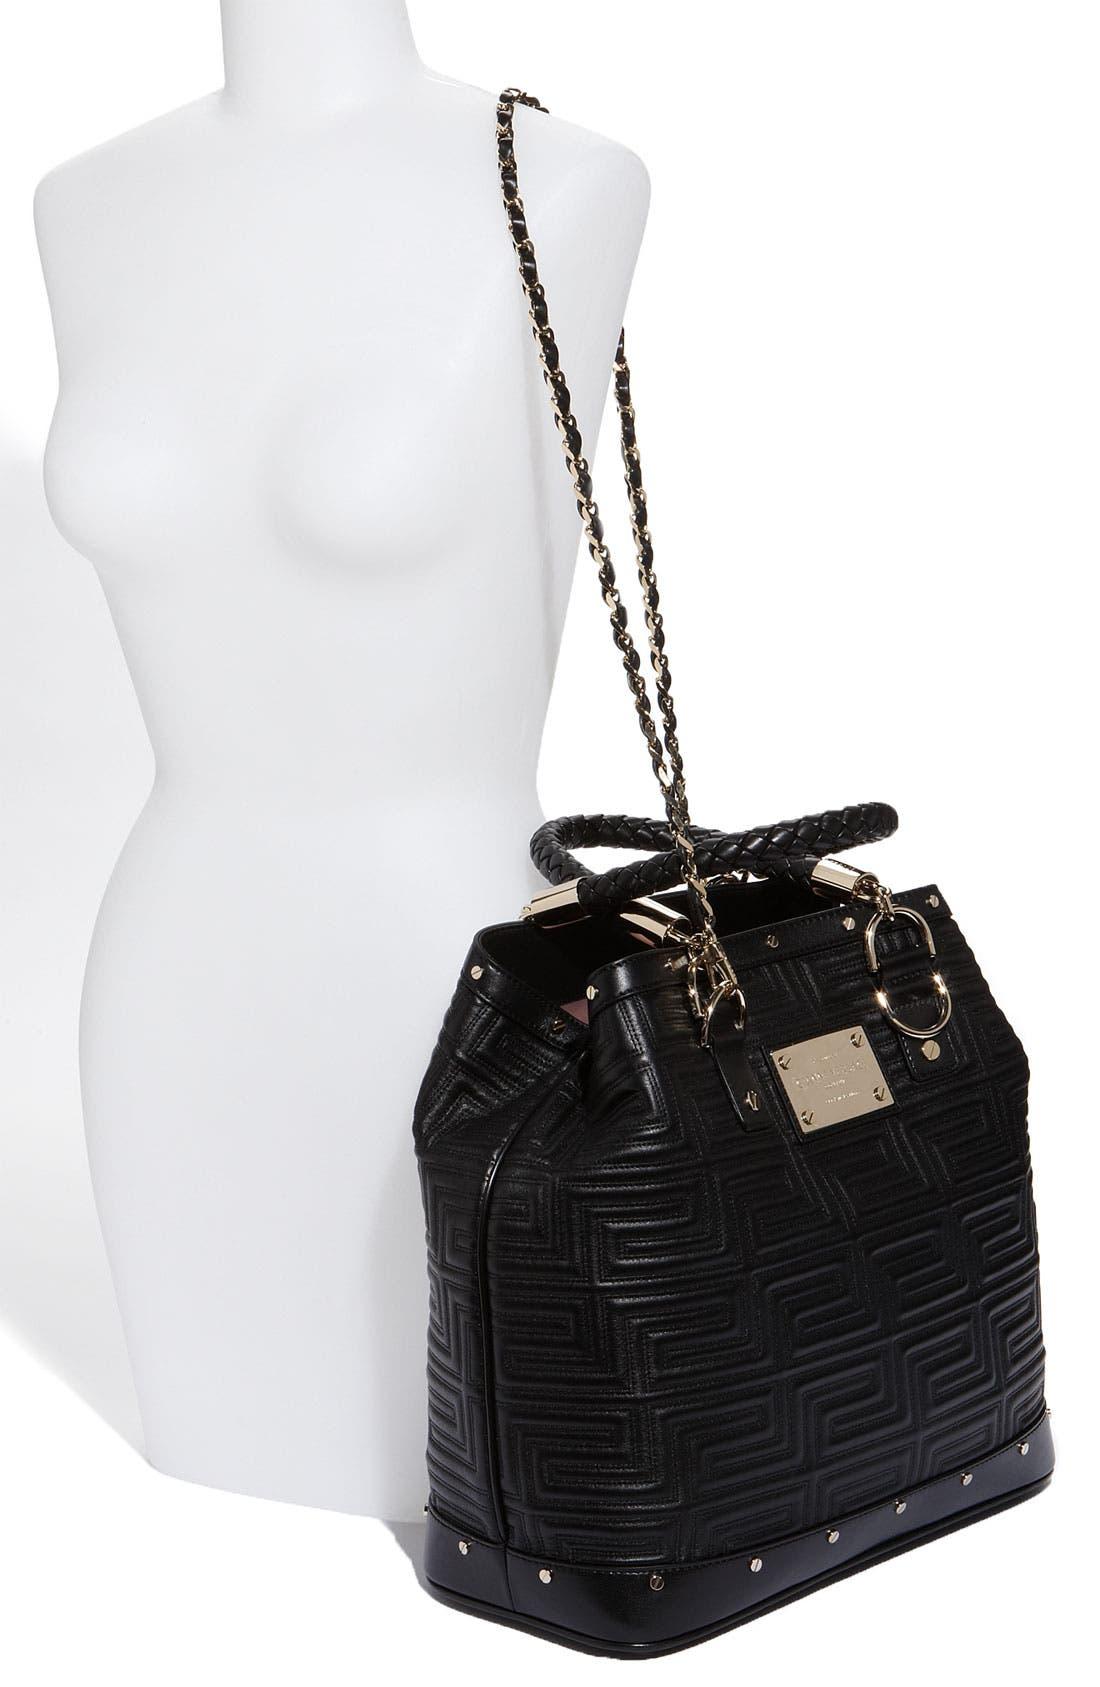 Alternate Image 2  - Versace 'Couture' Top Handle Shoulder Bag